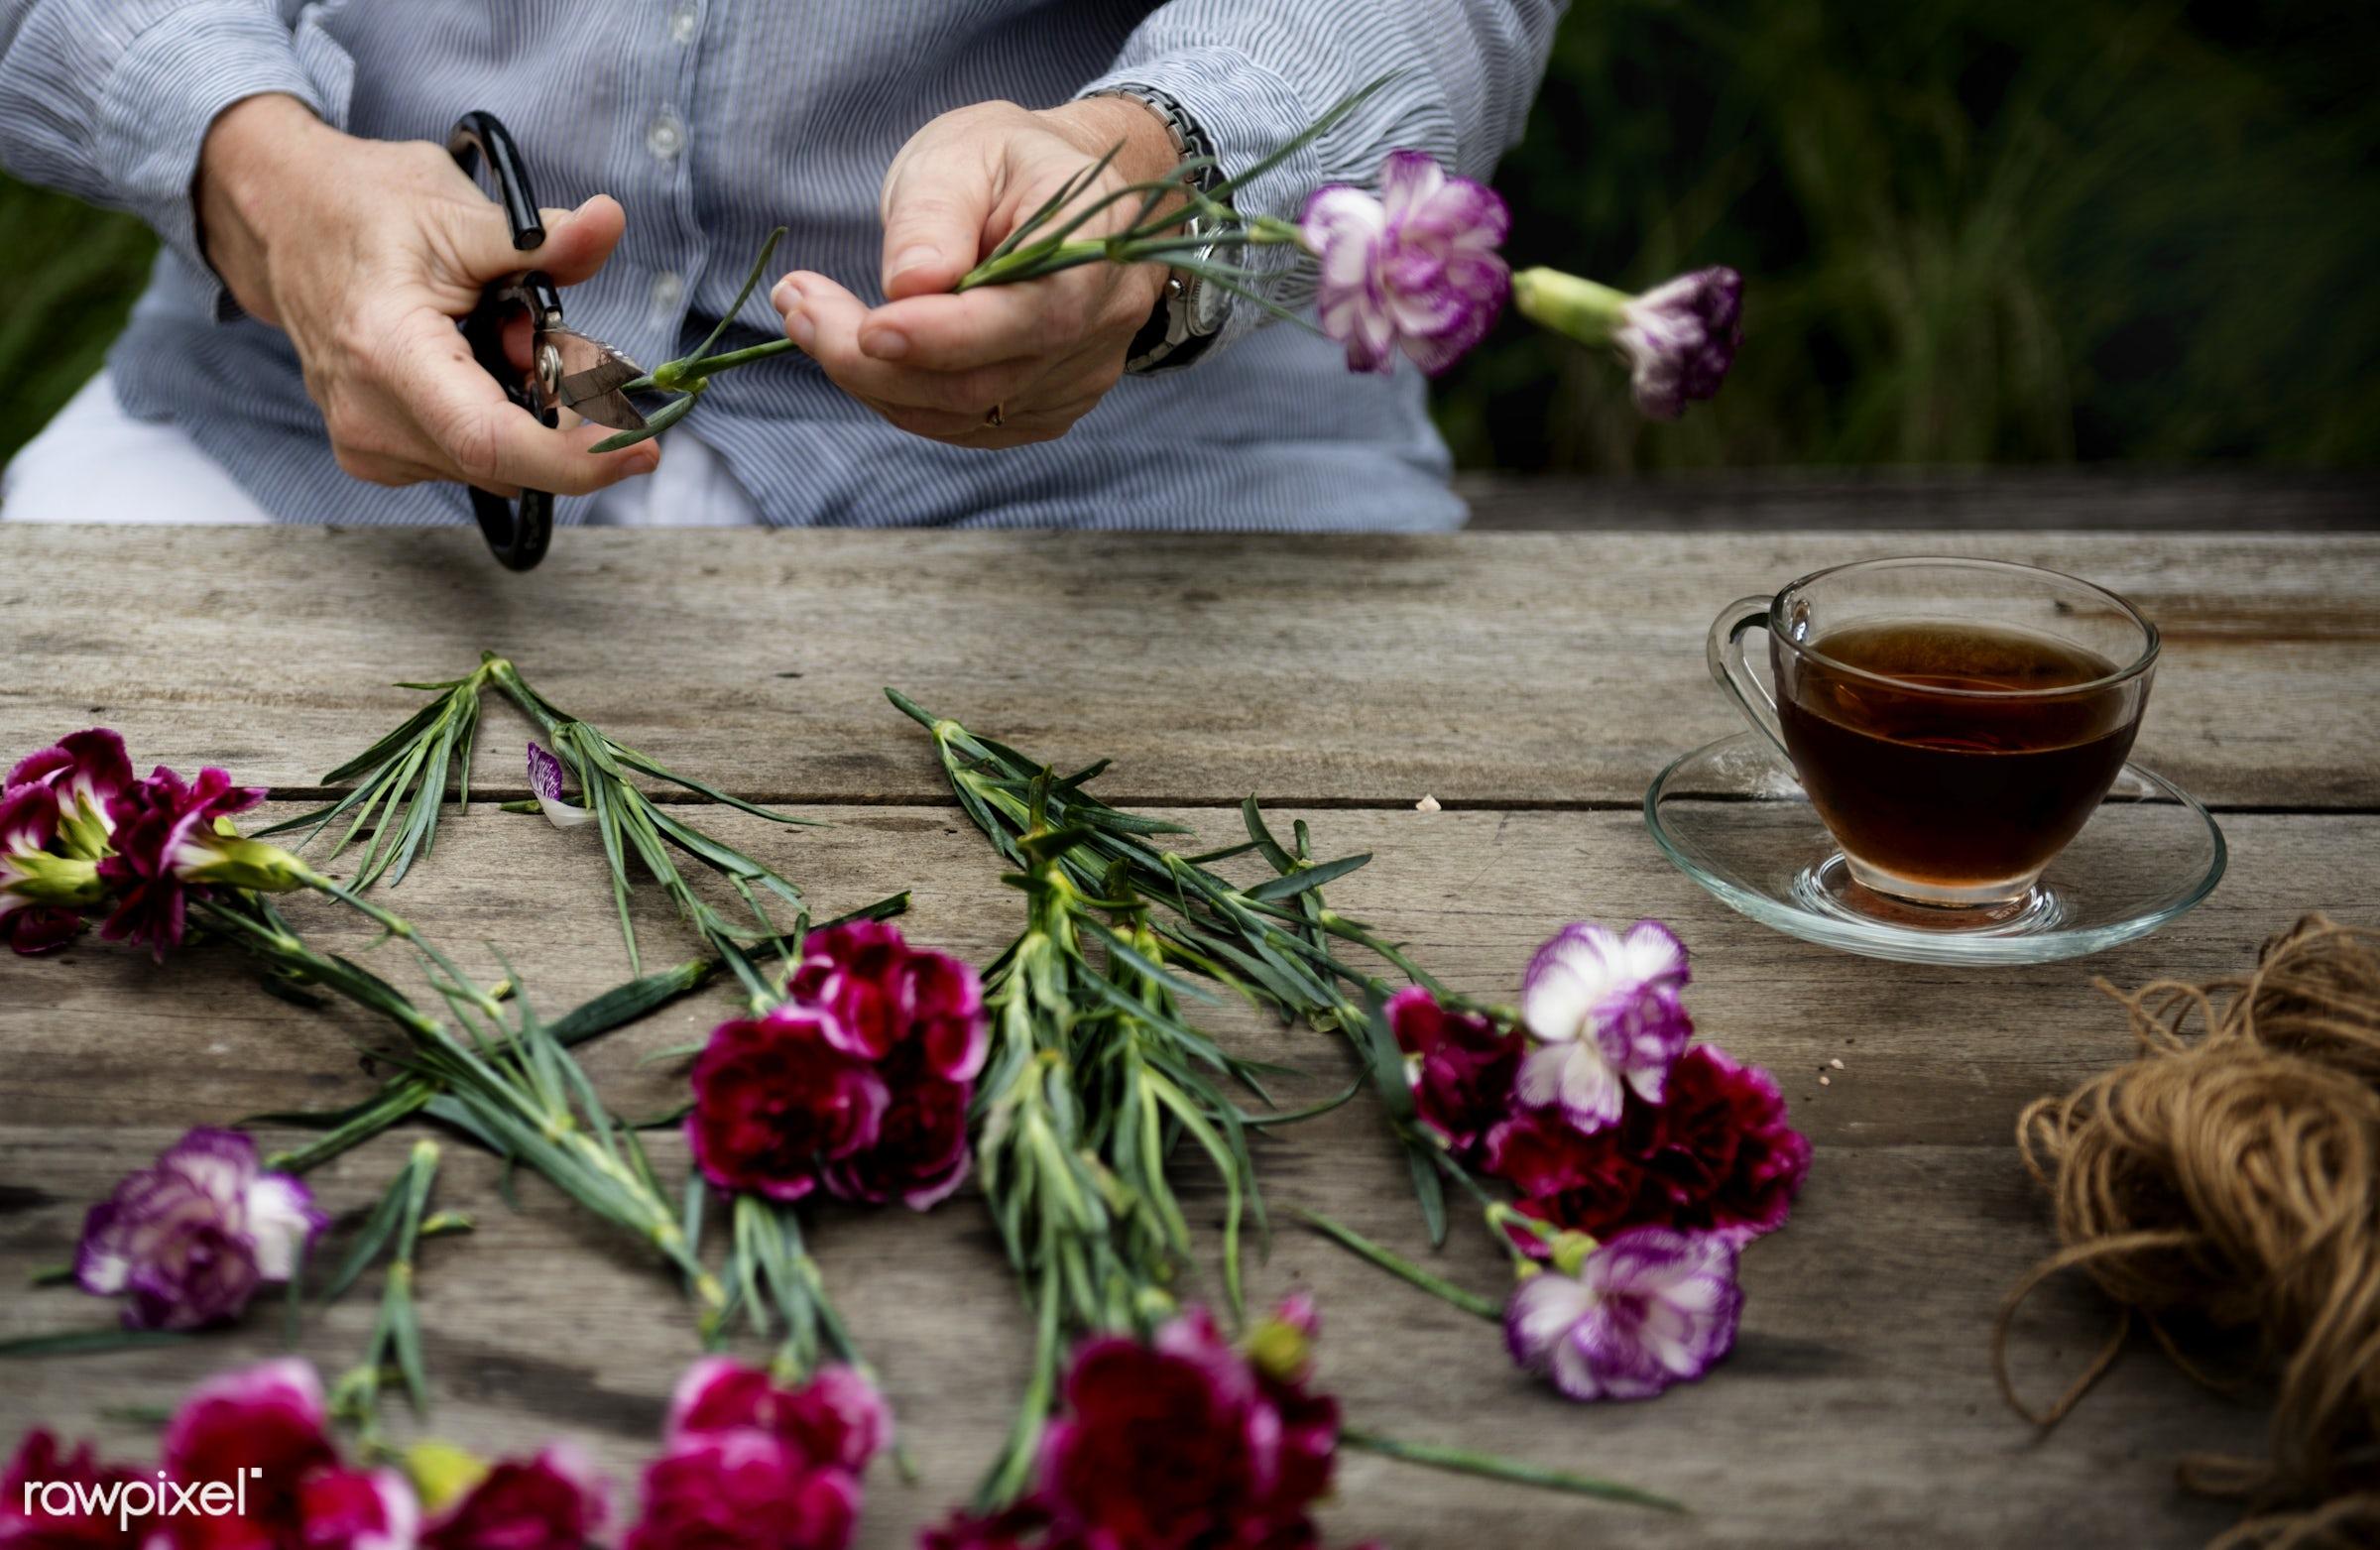 Florist hands trimming flower leaves  - green thumb, leaves, trimming, scissors, coffee, table, flowers, plants, hobbies,...